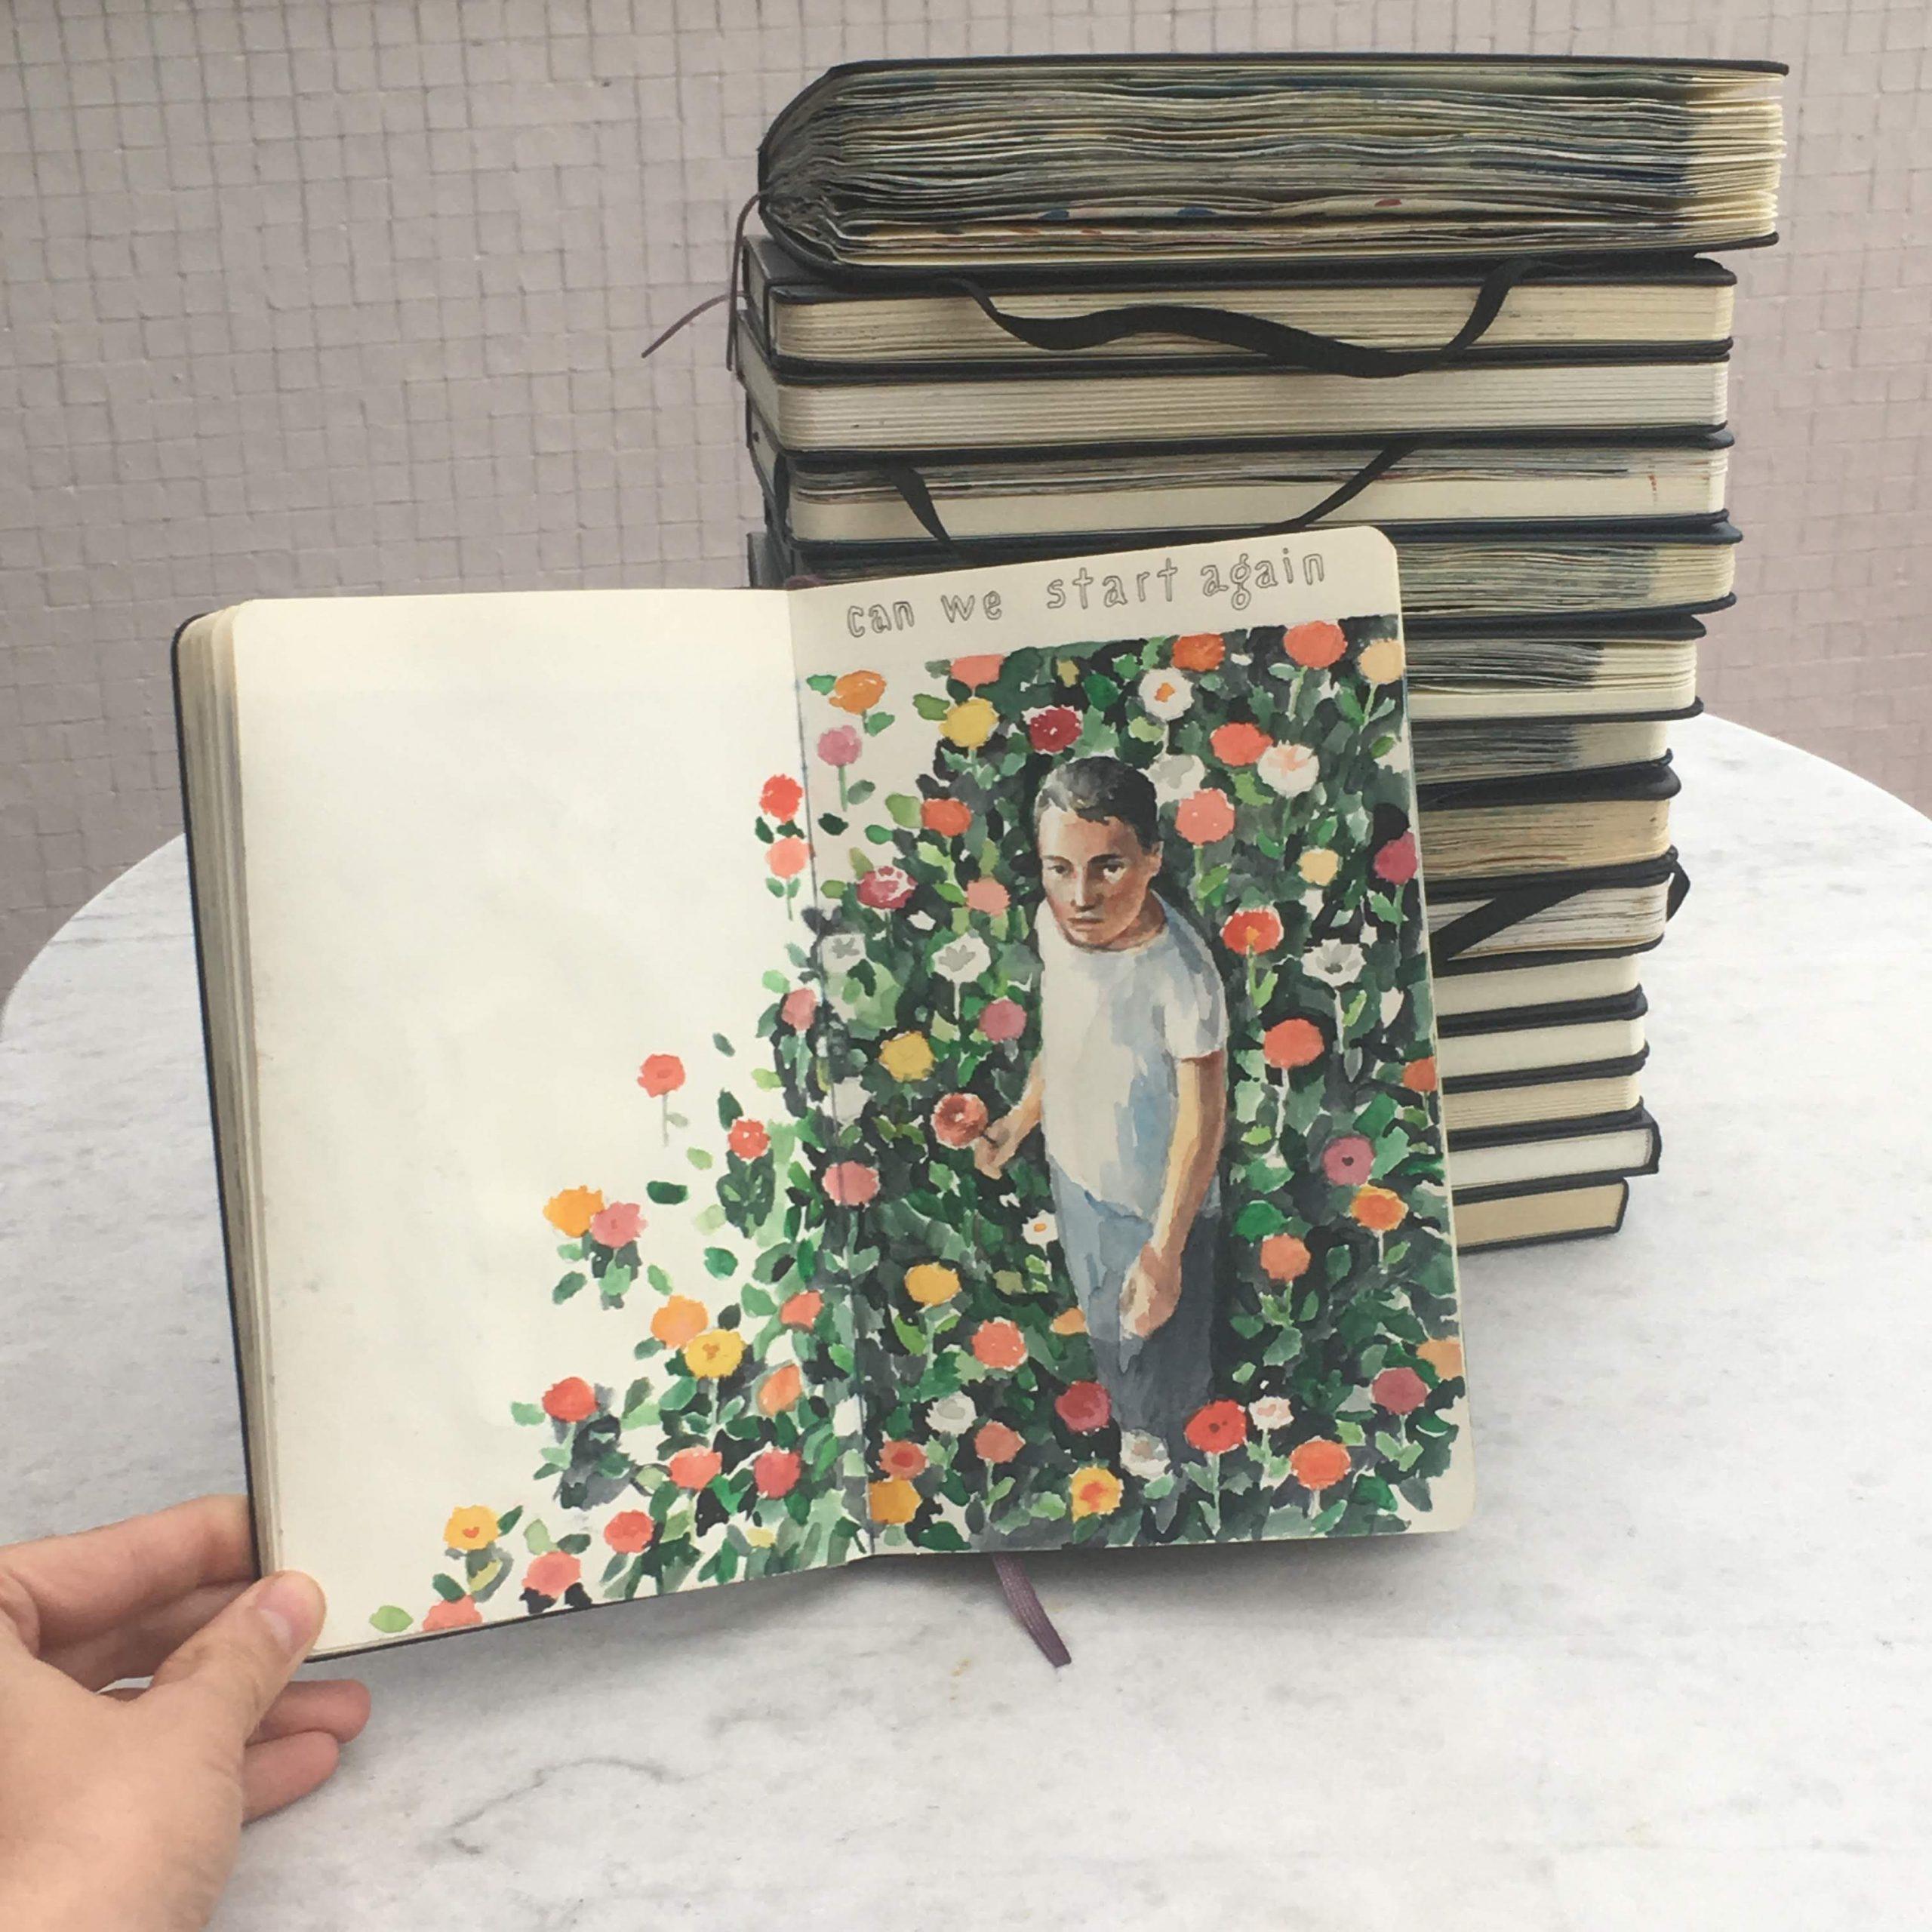 Moleskine songbooks